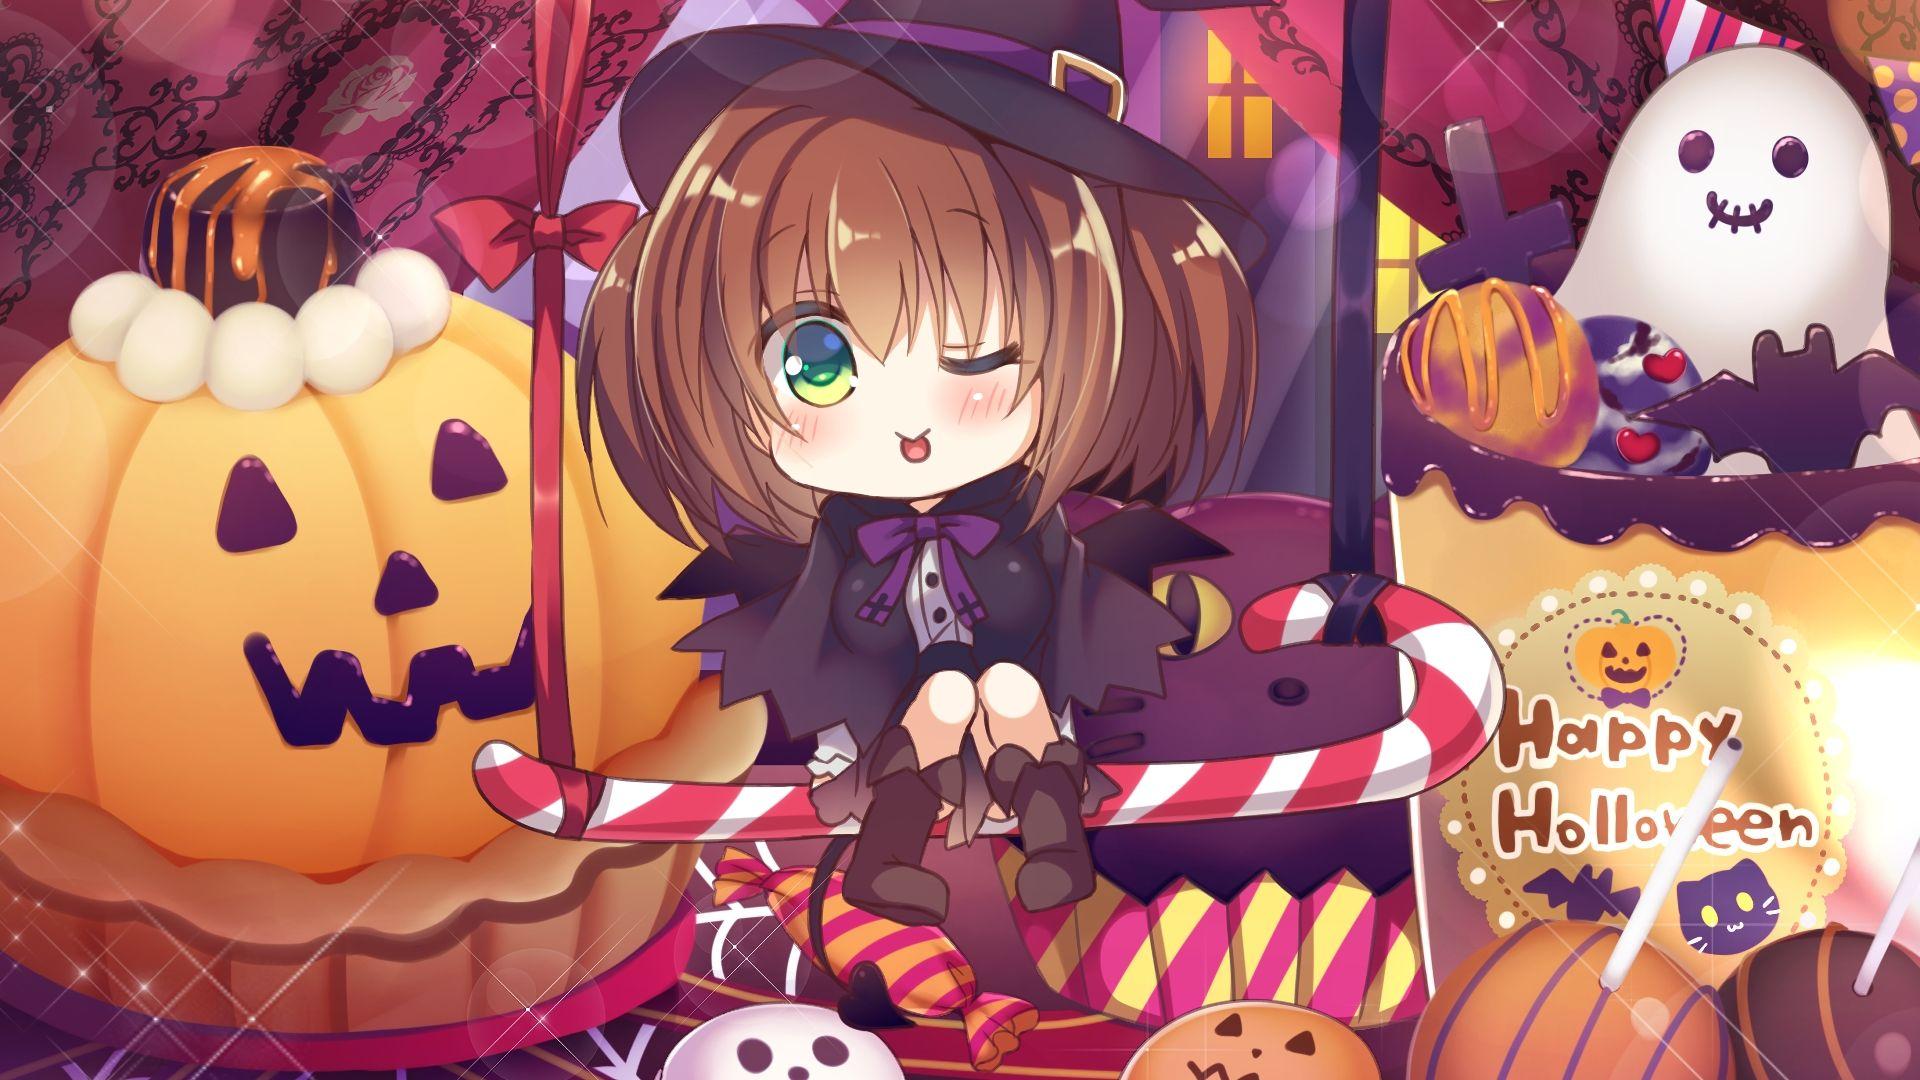 Wallpaper Cute, little witch, 2017,  anime girl, halloween